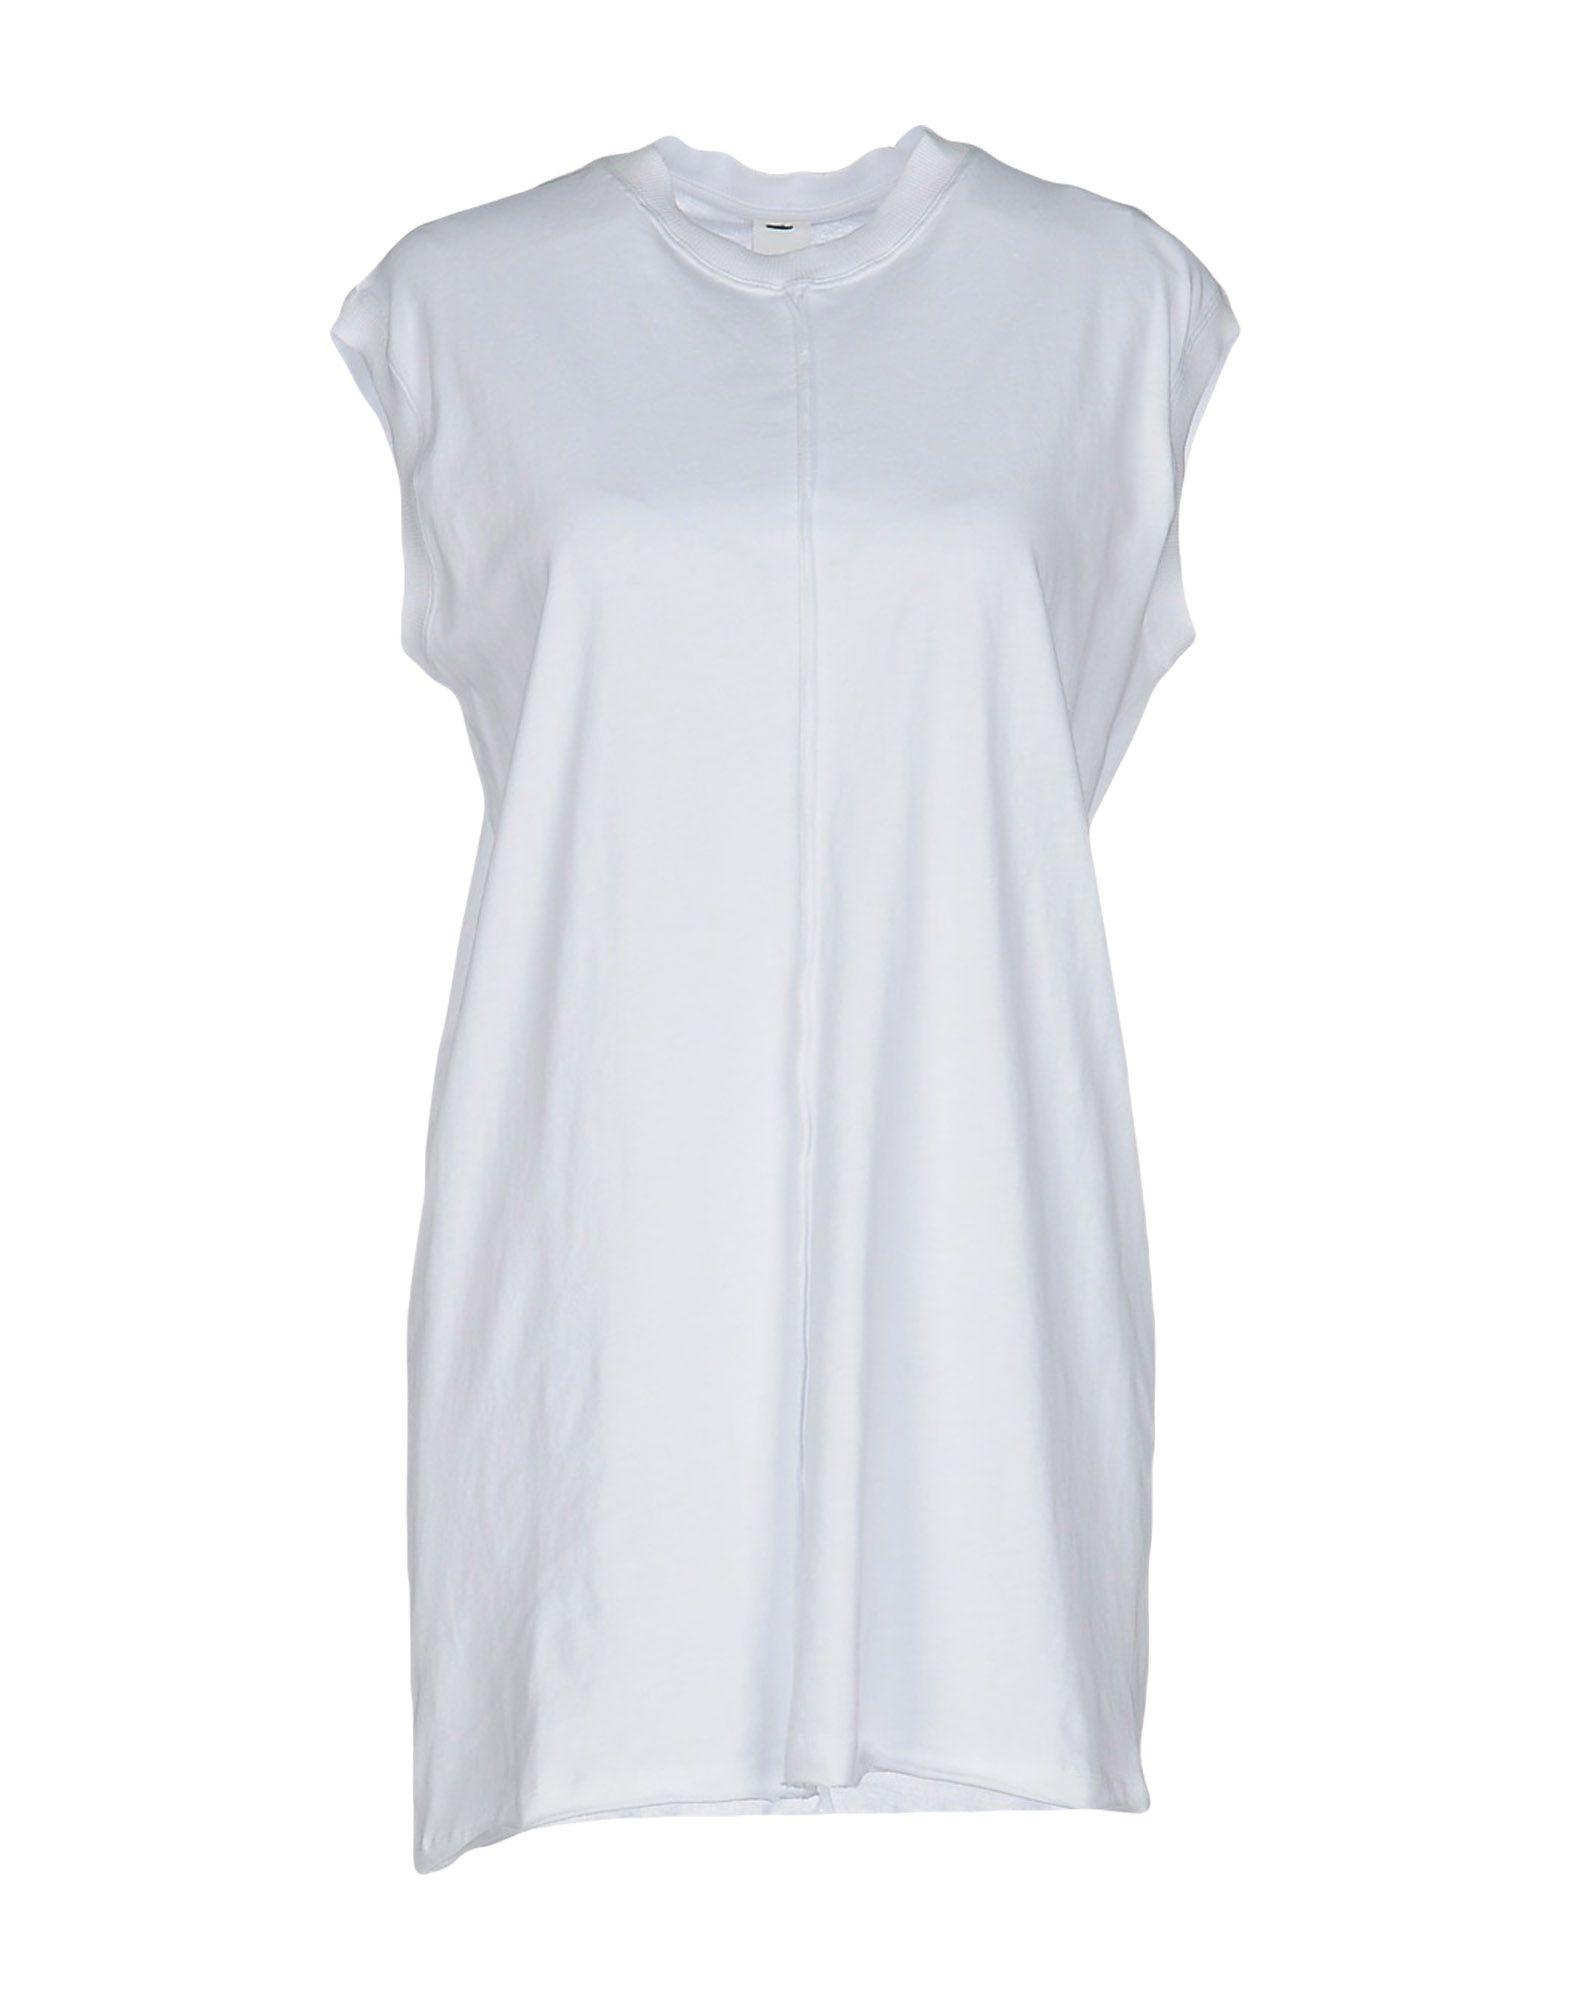 DAMIR DOMA Футболка damir doma футболка с длинными рукавами